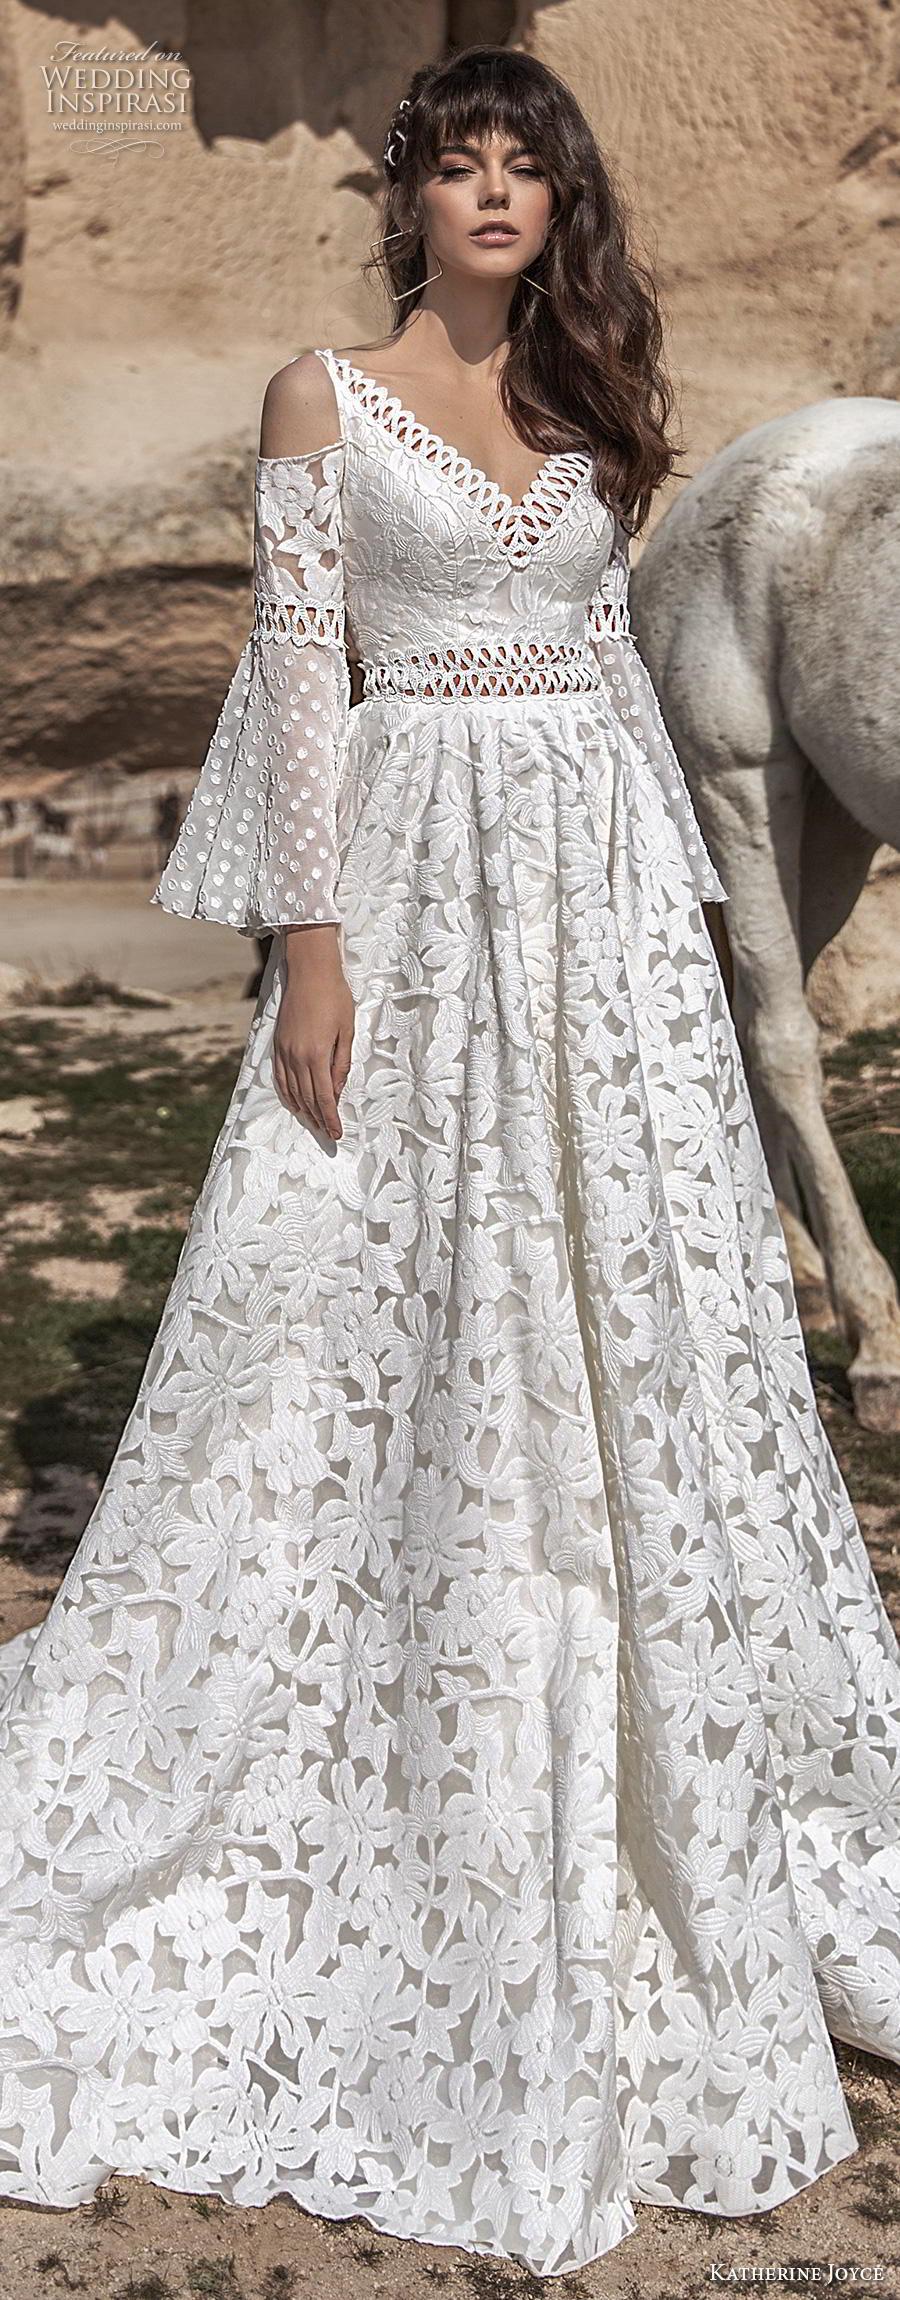 katherine joyce 2020 bridal cold shoulder long funnel sleeves v neck full embellishment romantic bohemian a  line wedding dress open v back chapel train (1) lv